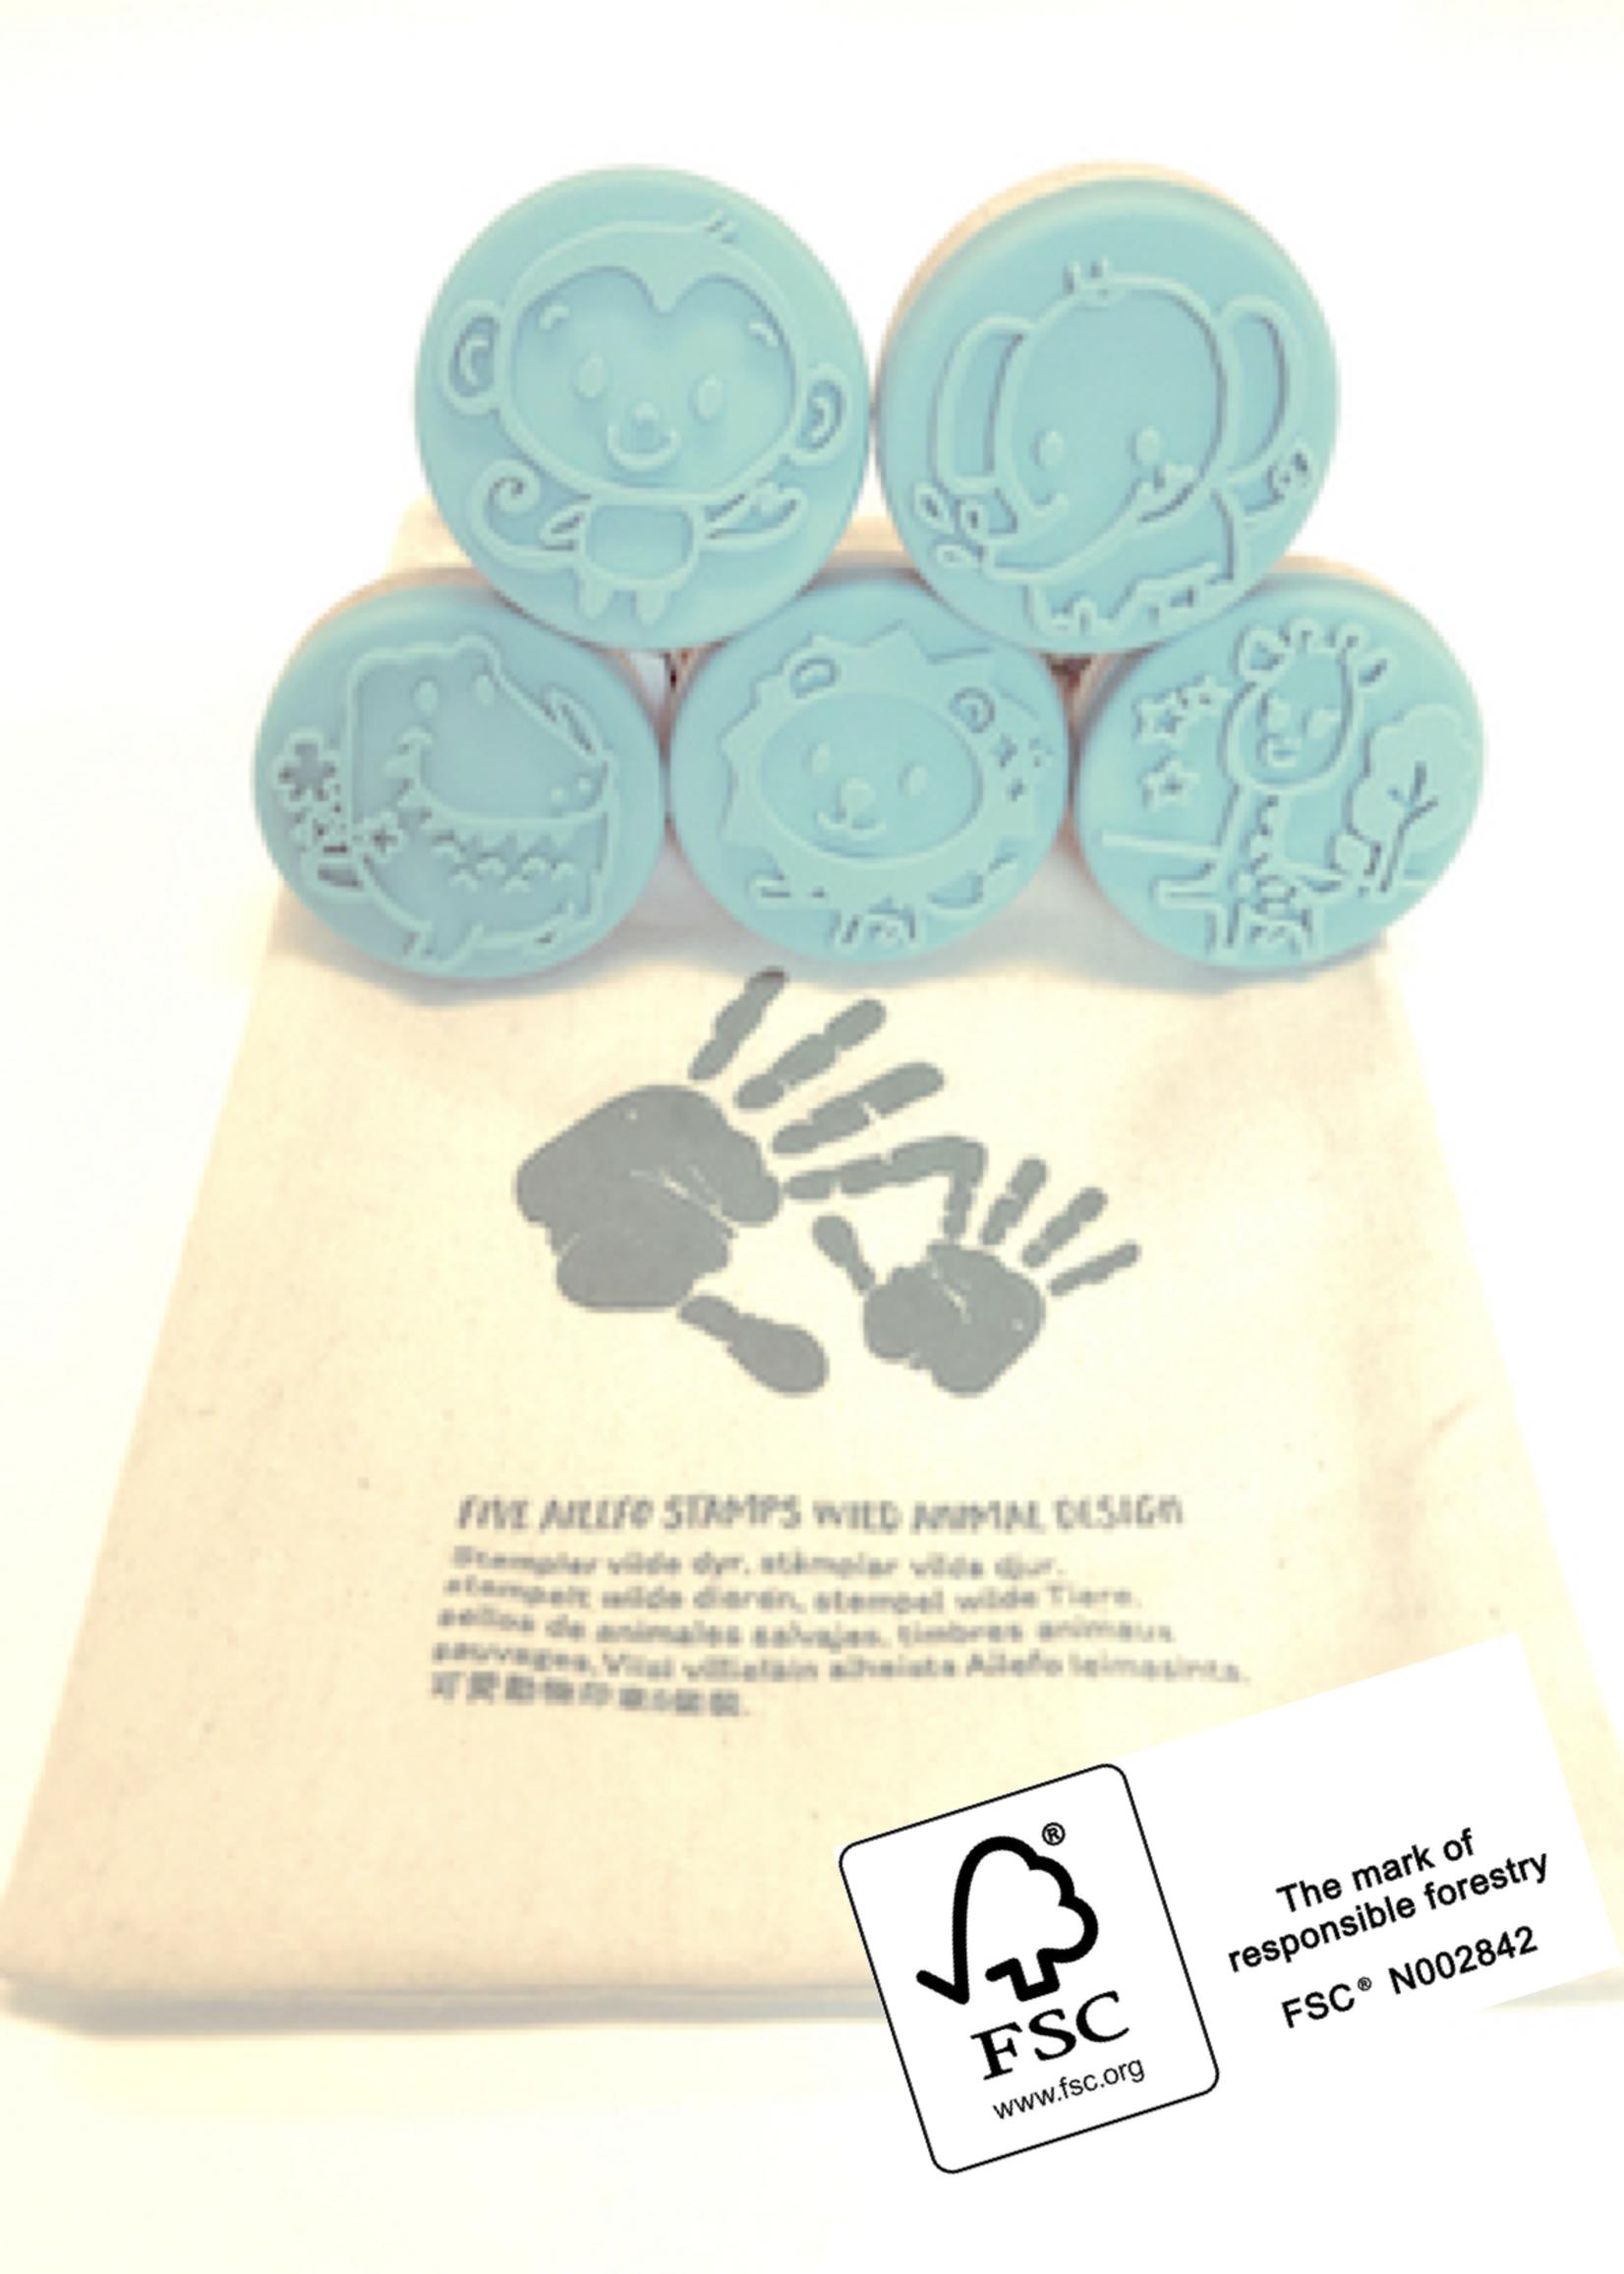 Ailefo Ailefo - Wildlife stories, Stamps (5 stuks)